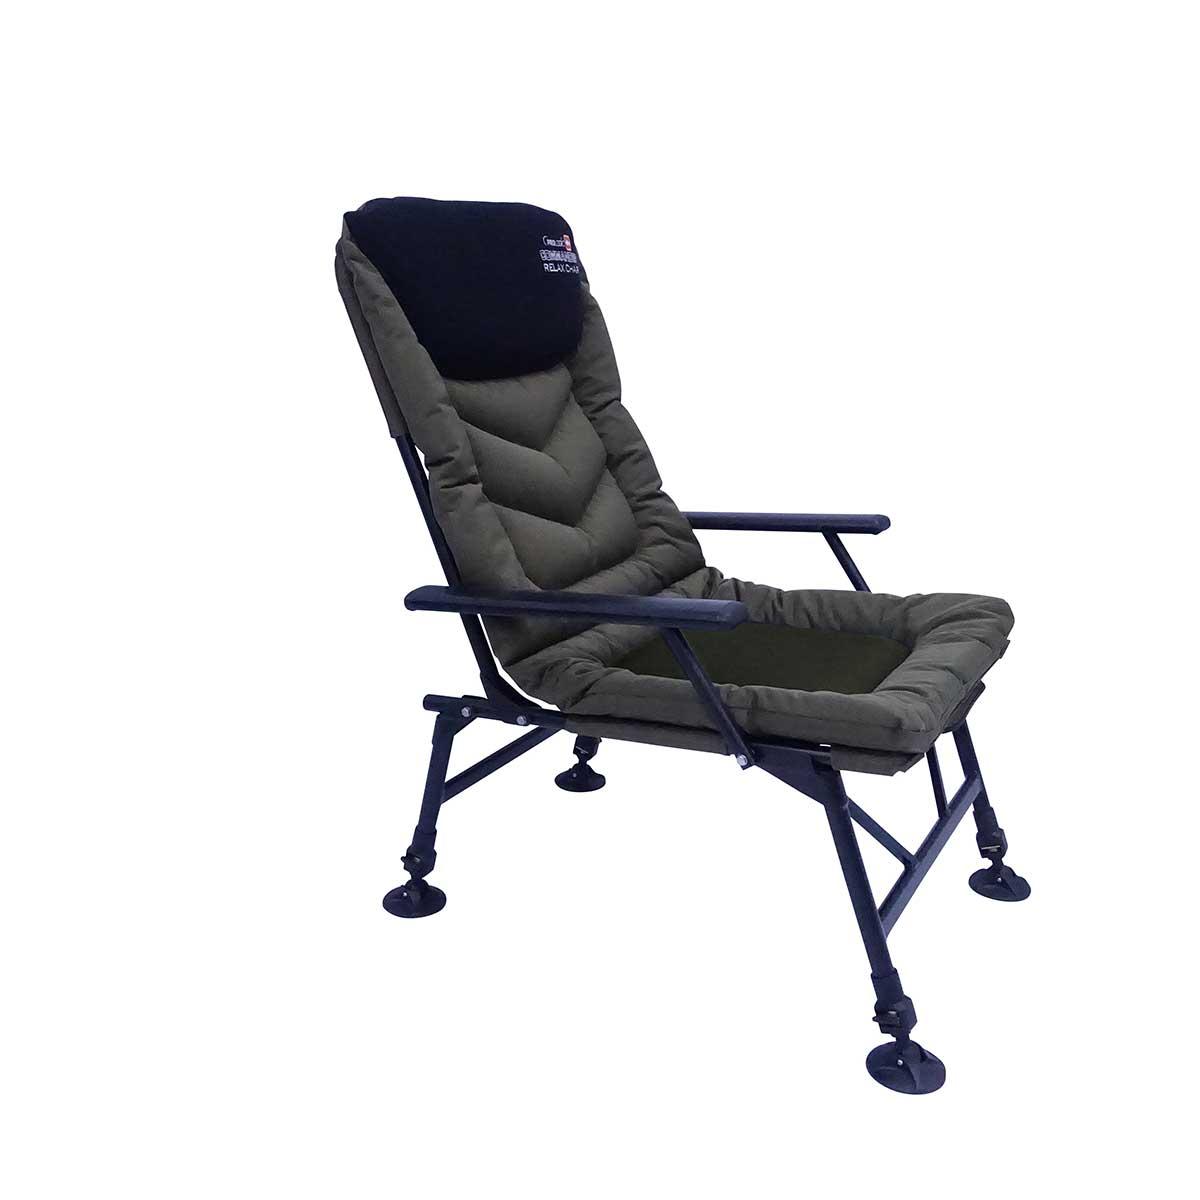 54335-PL-Commander-Travel-Chair.jpg